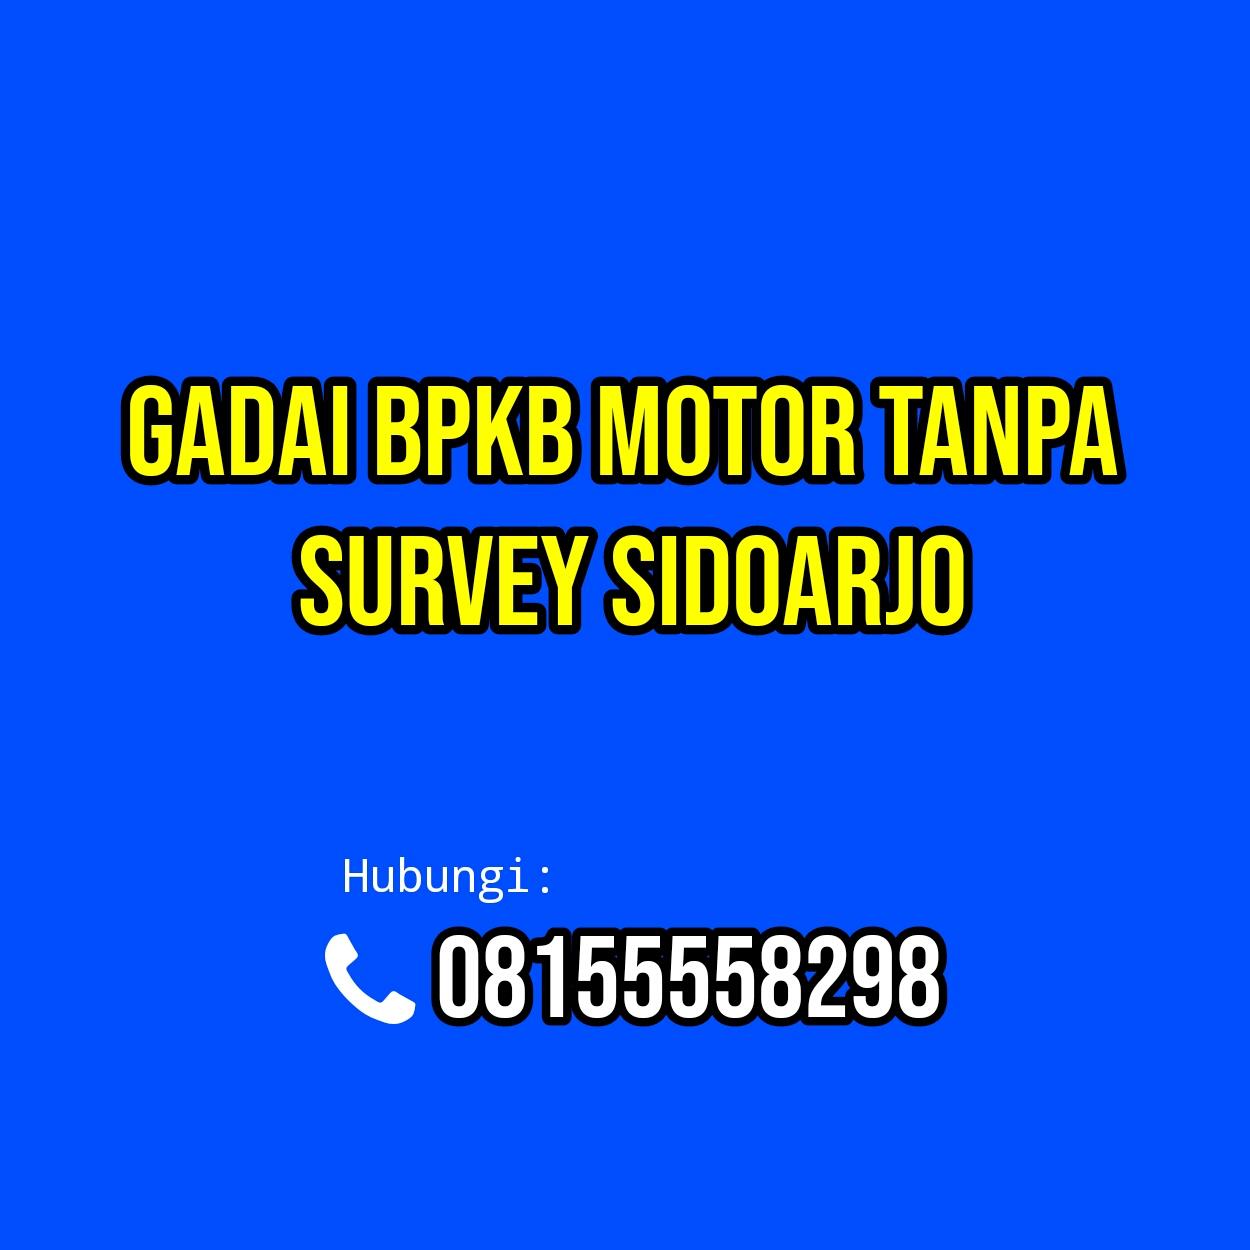 Pinjaman Dana Tanpa Survey Sidoarjo Jaminan Bpkb Motor Online